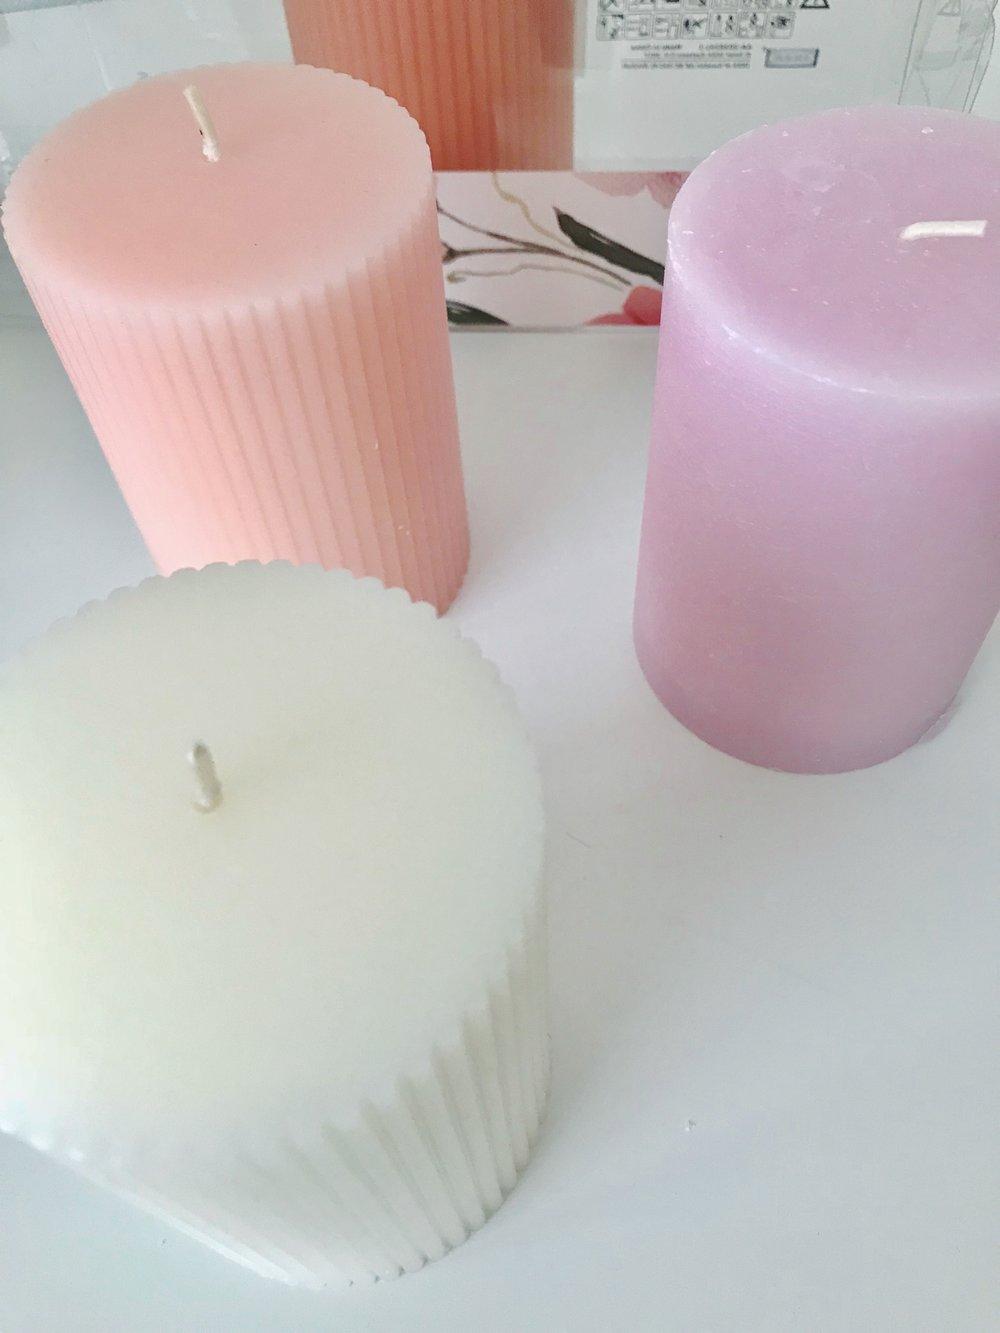 Ikea candles